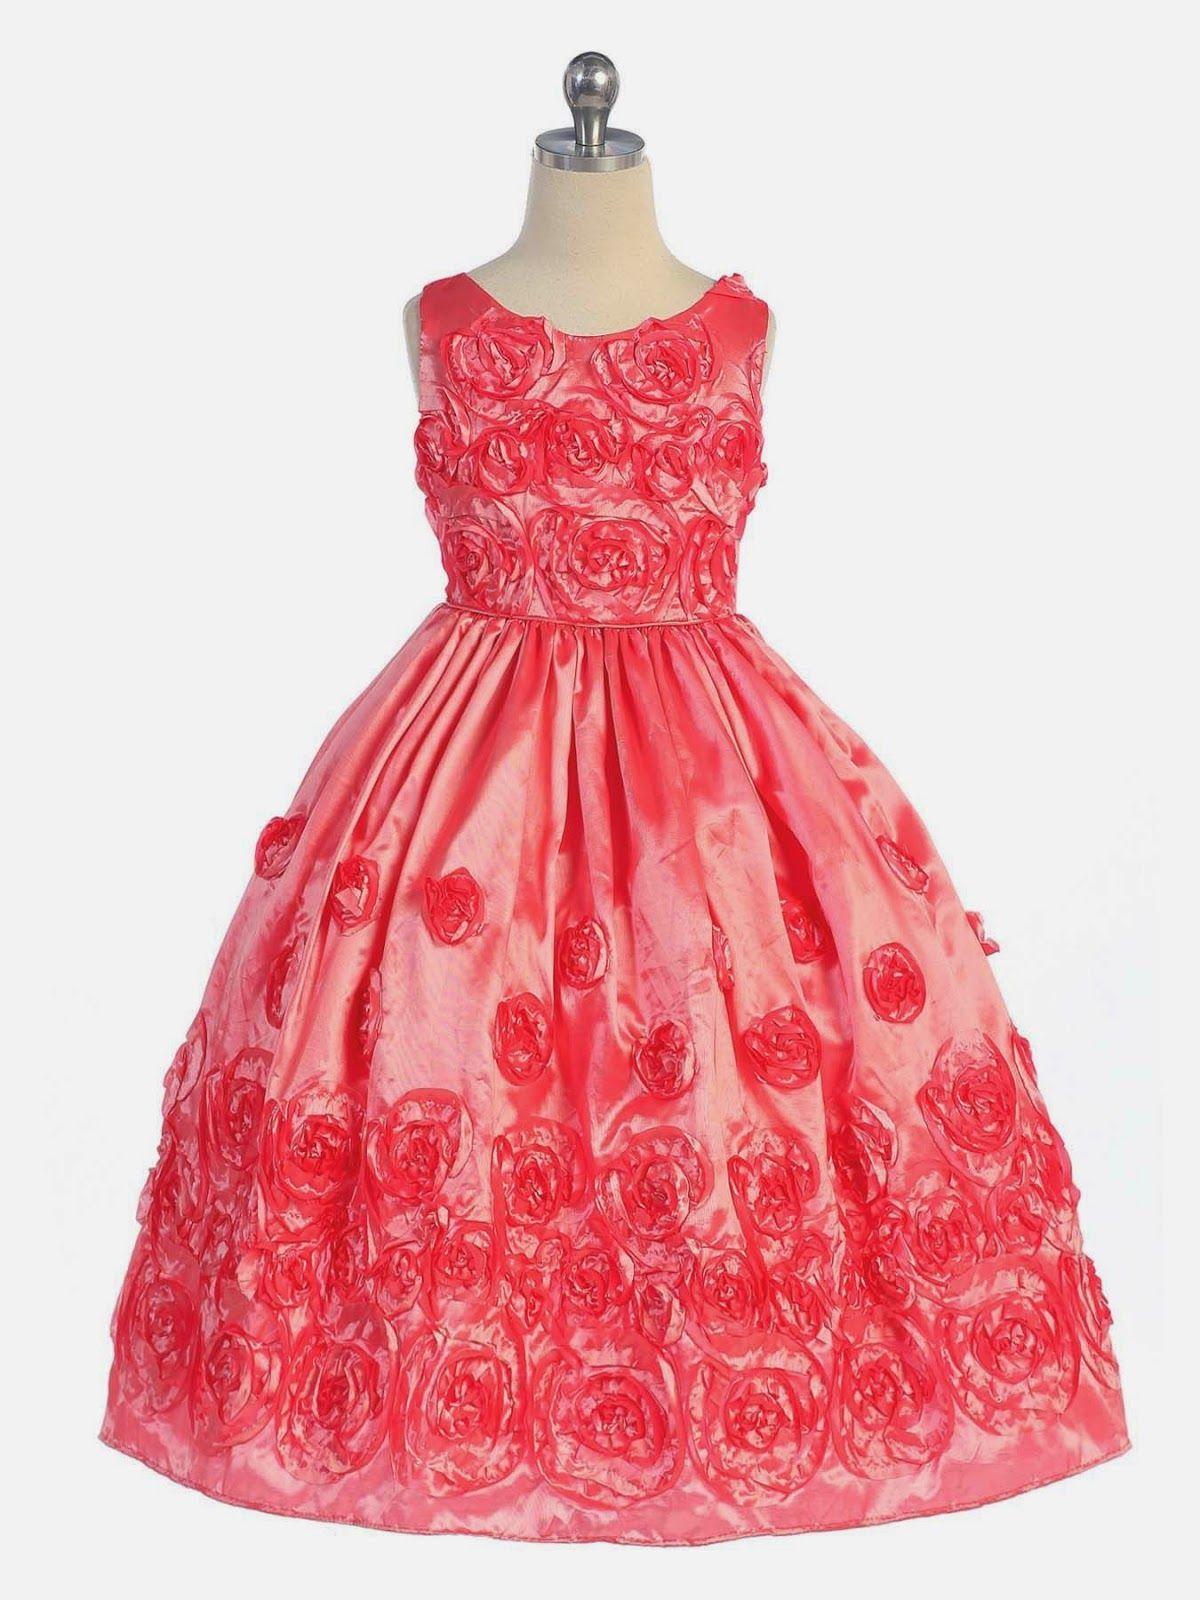 Vestidos Niña de las Flores, Color Coral | Bodas | Pinterest ...